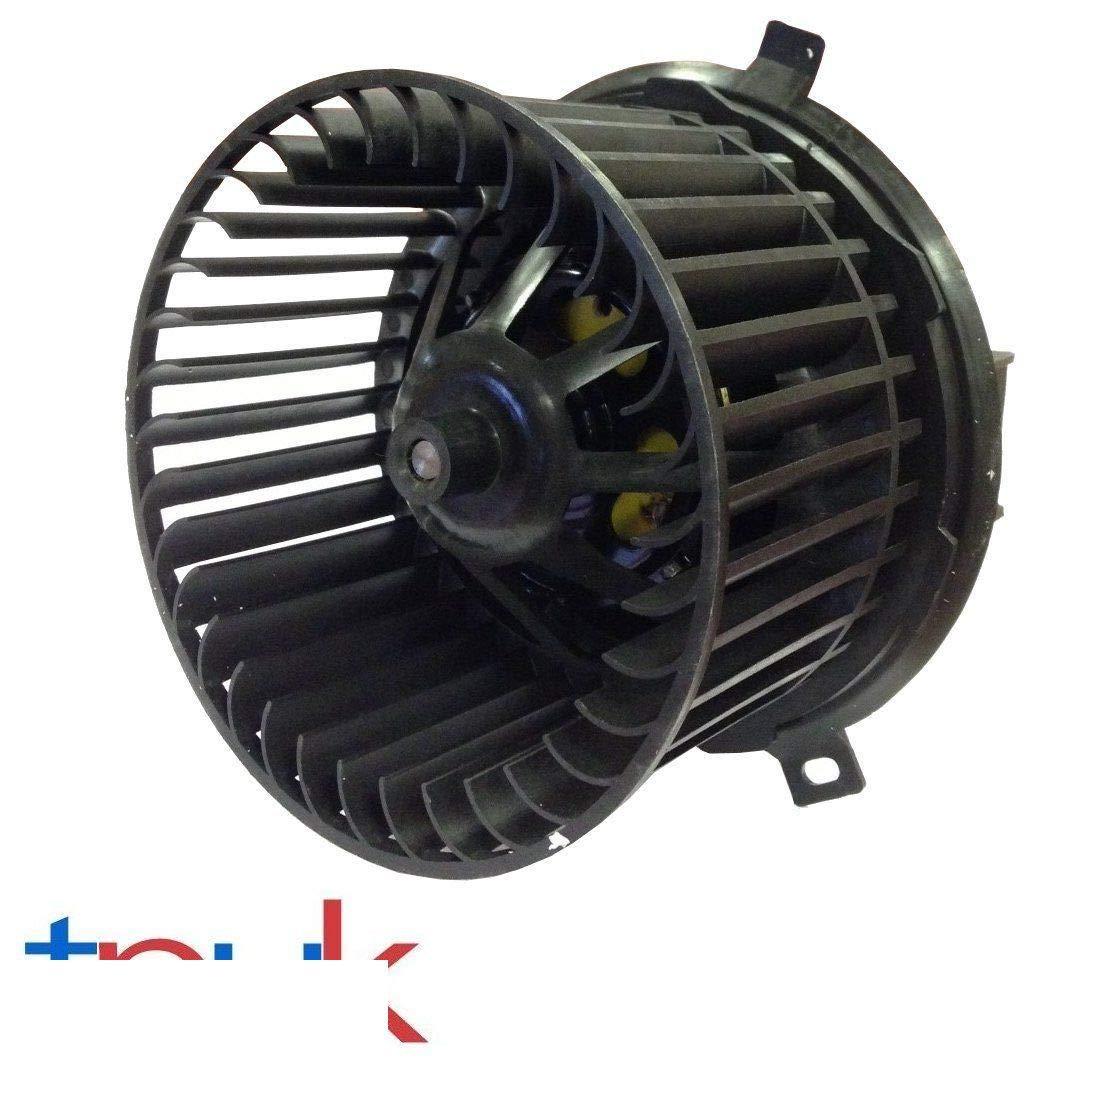 Transit Parts Transit MK5 Heater Blower Fan Motor 94-2000 Brand New